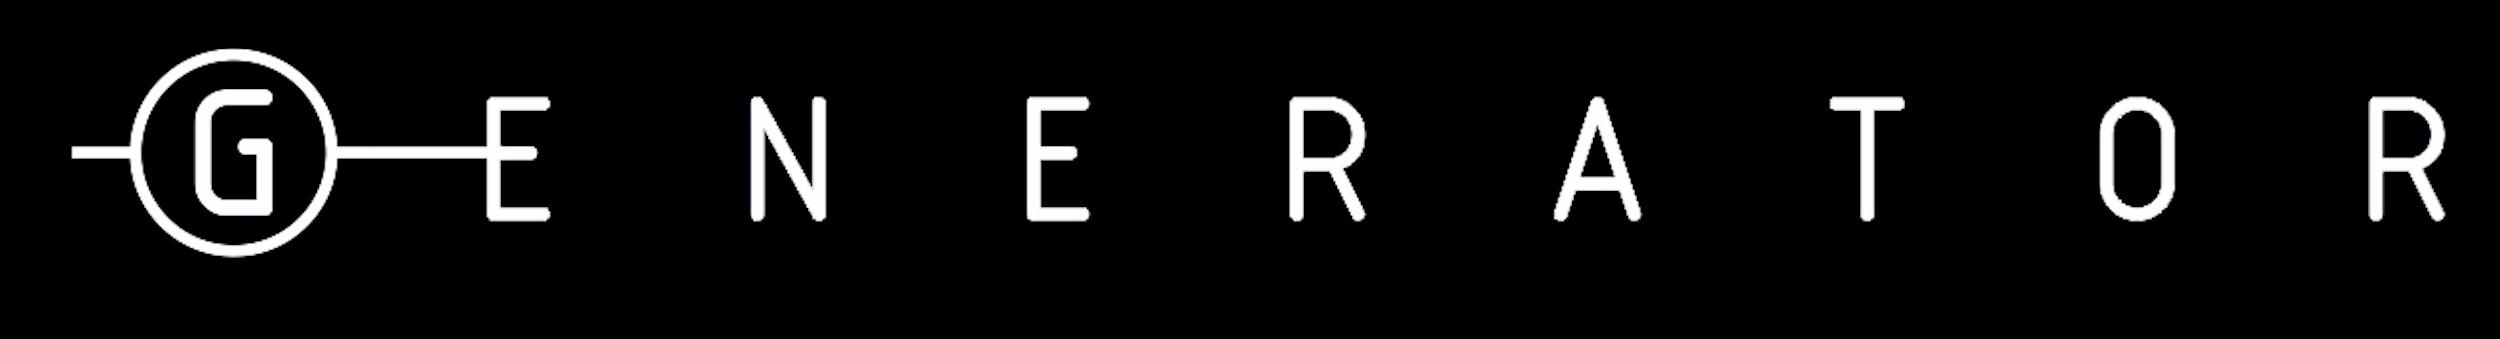 generator logo.jpg